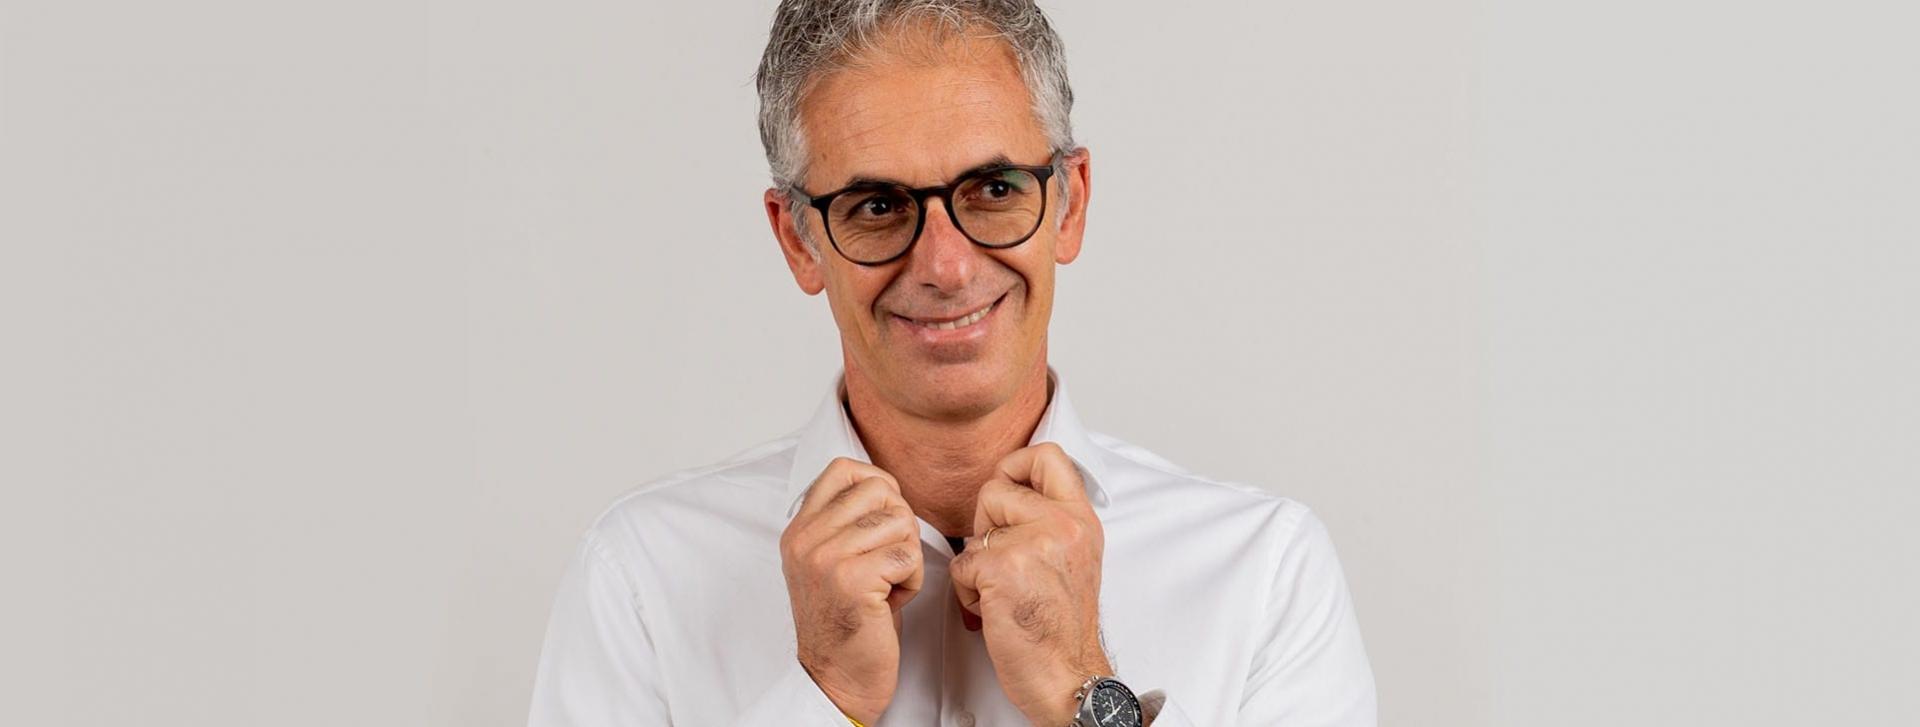 Mauro Peloso